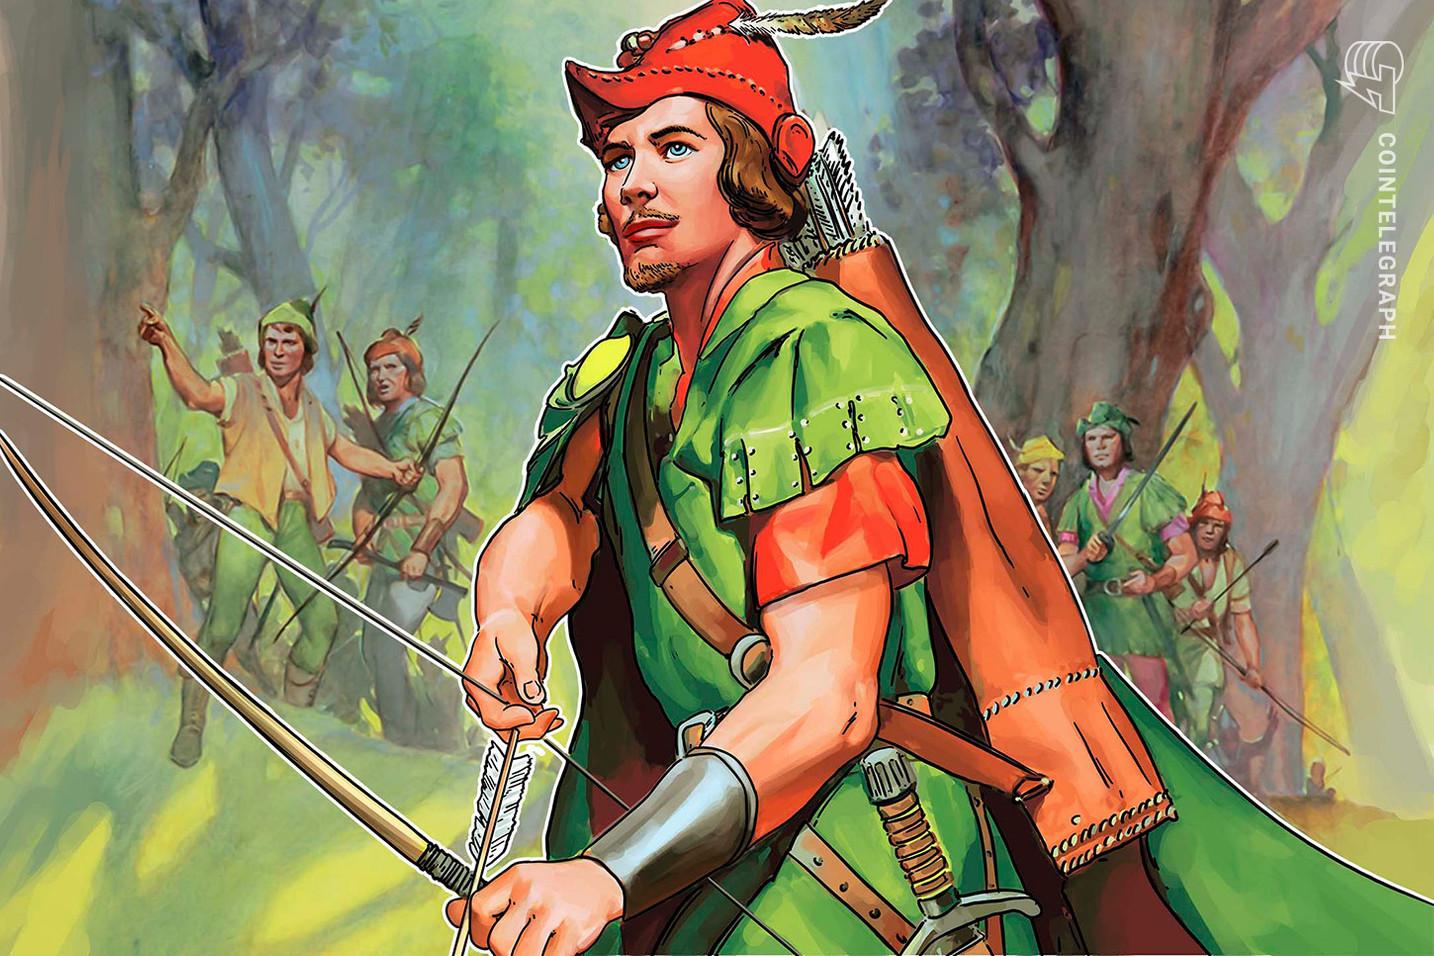 Robinhood memperingatkan penurunan pendapatan crypto akan datang di tengah pengajuan IPO